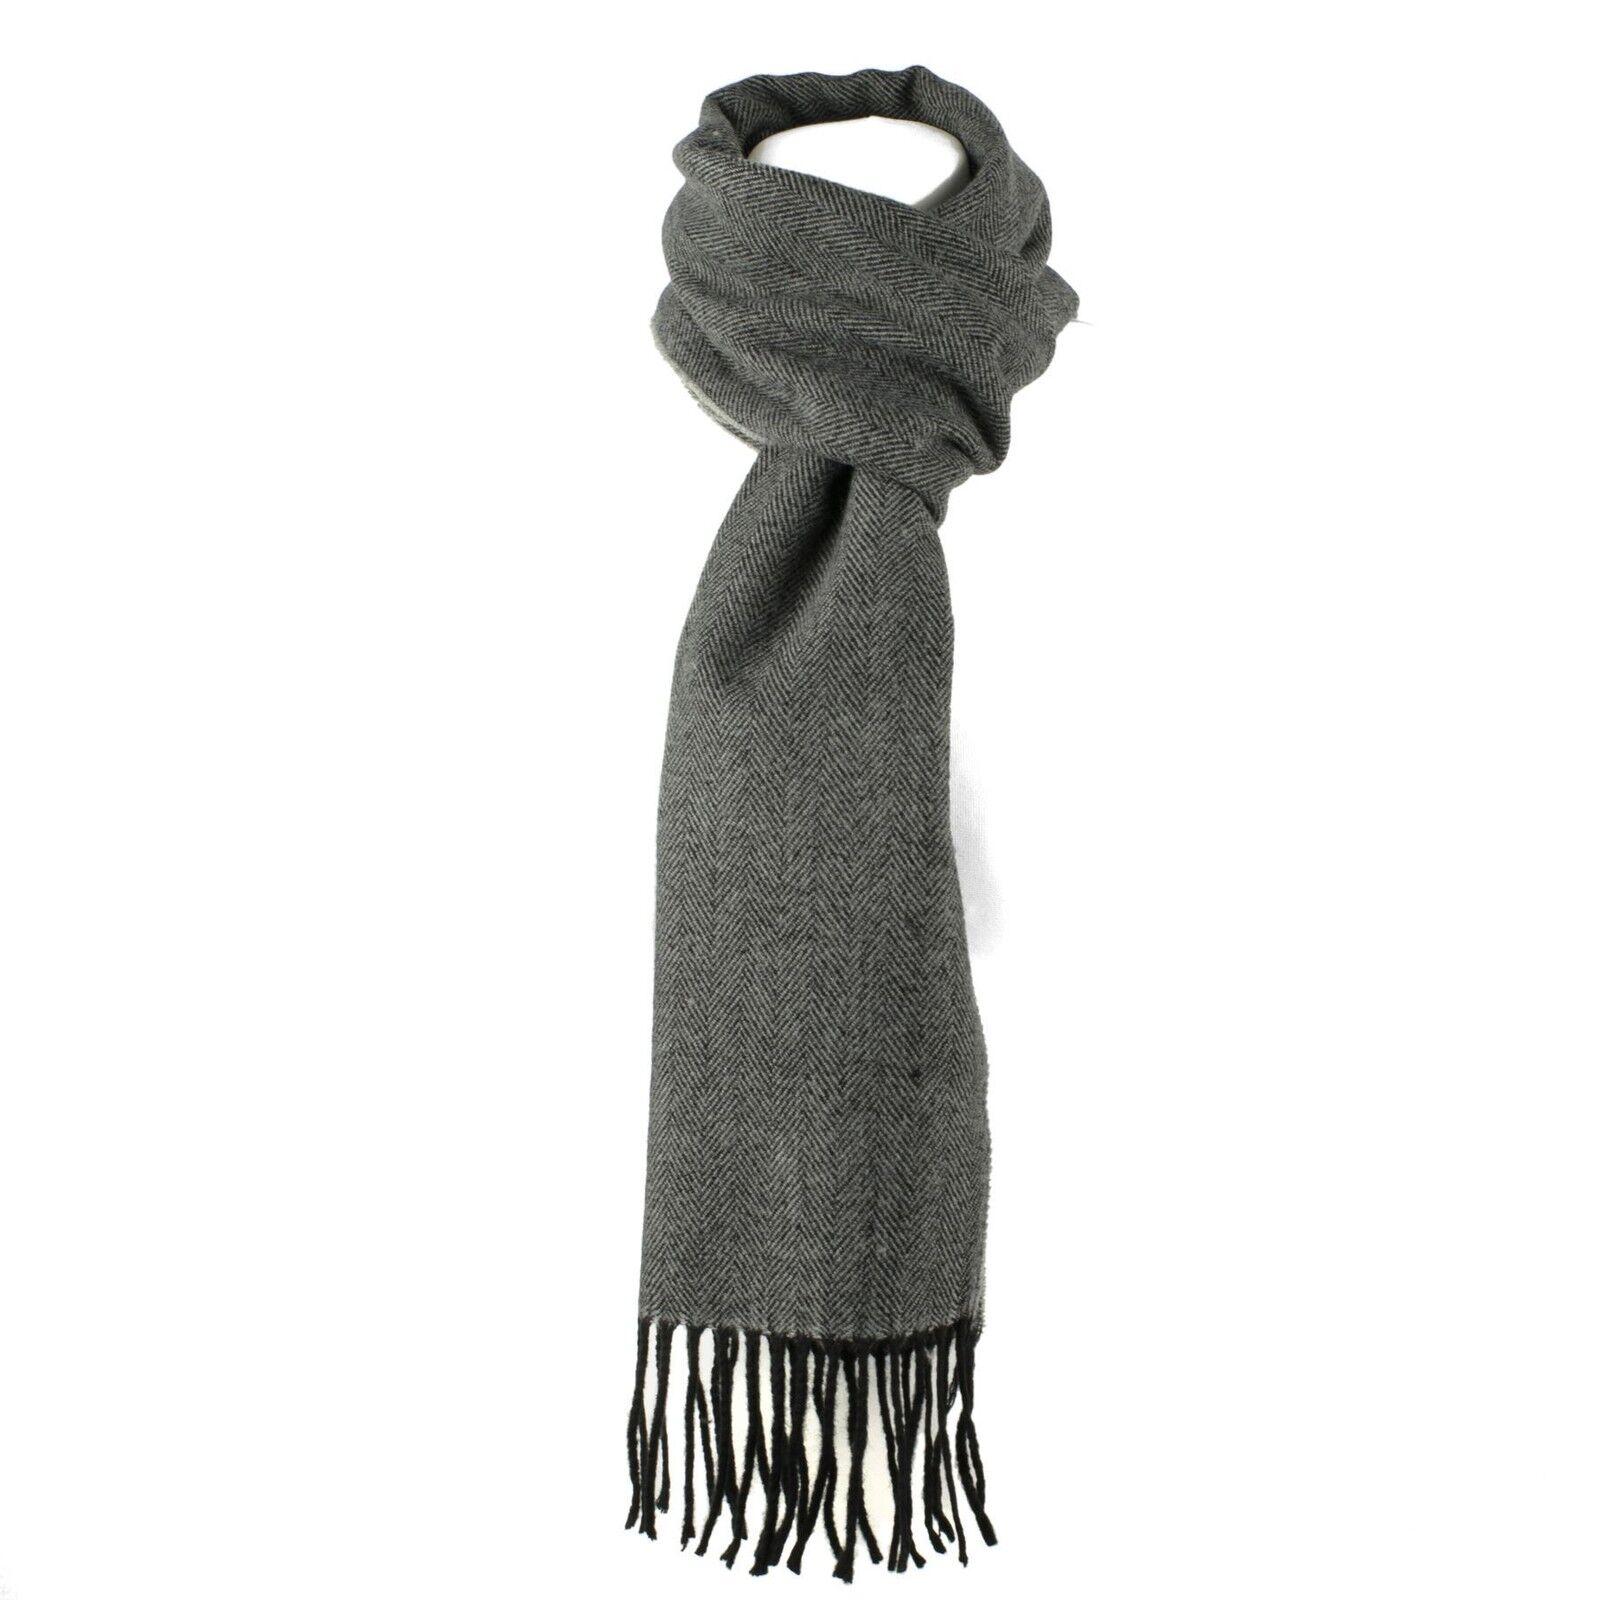 1a8e28bb1ec Luxury Wool Blend Unisex Herringbone Pattern Winter Scarf Dark Grey